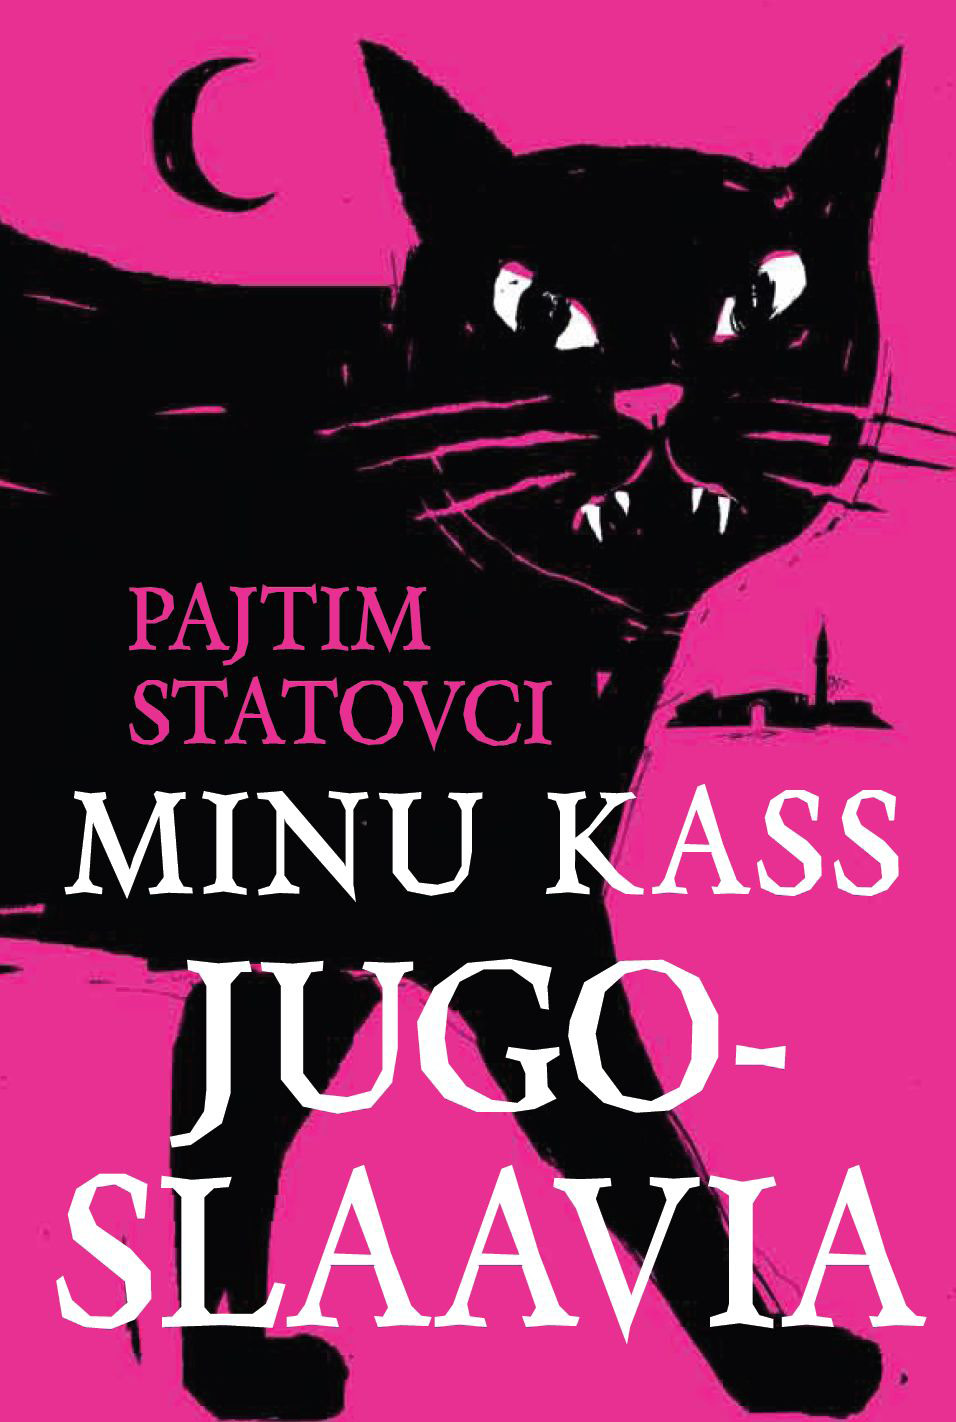 Pajtim Statovci Minu kass Jugoslaavia hille hanso minu istanbul poolik ja tervik